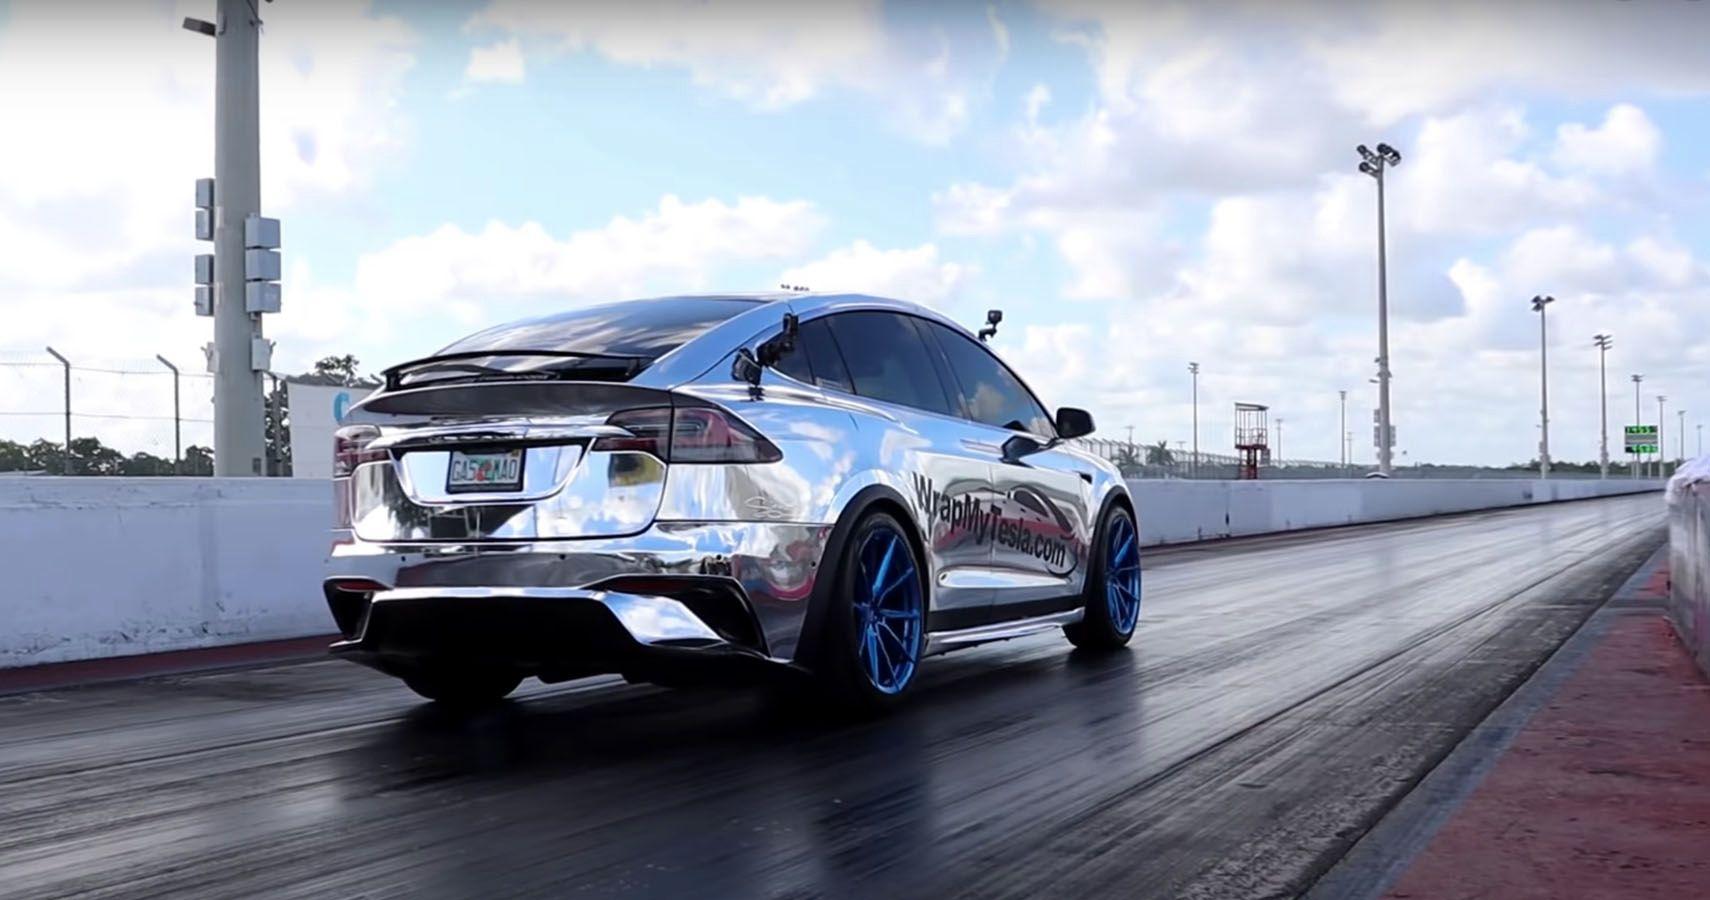 Tesla Model X Performance With Cheetah Stance Runs World Record Quarter-Mile